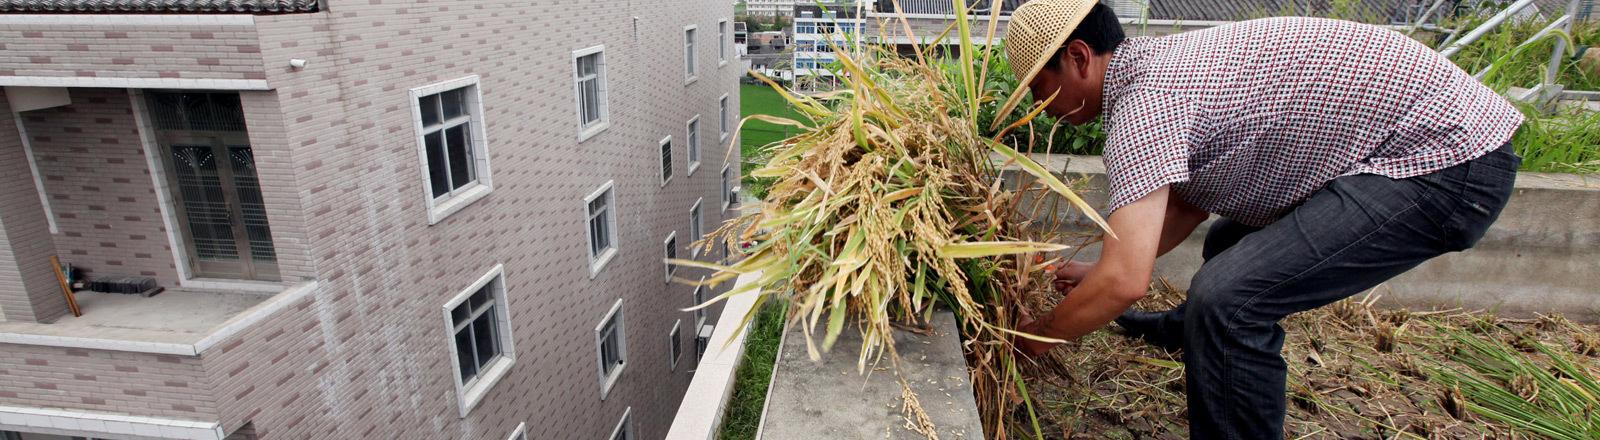 Ein Urban Farmer pflanzt auf dem Dach eines Hauses Reis an.